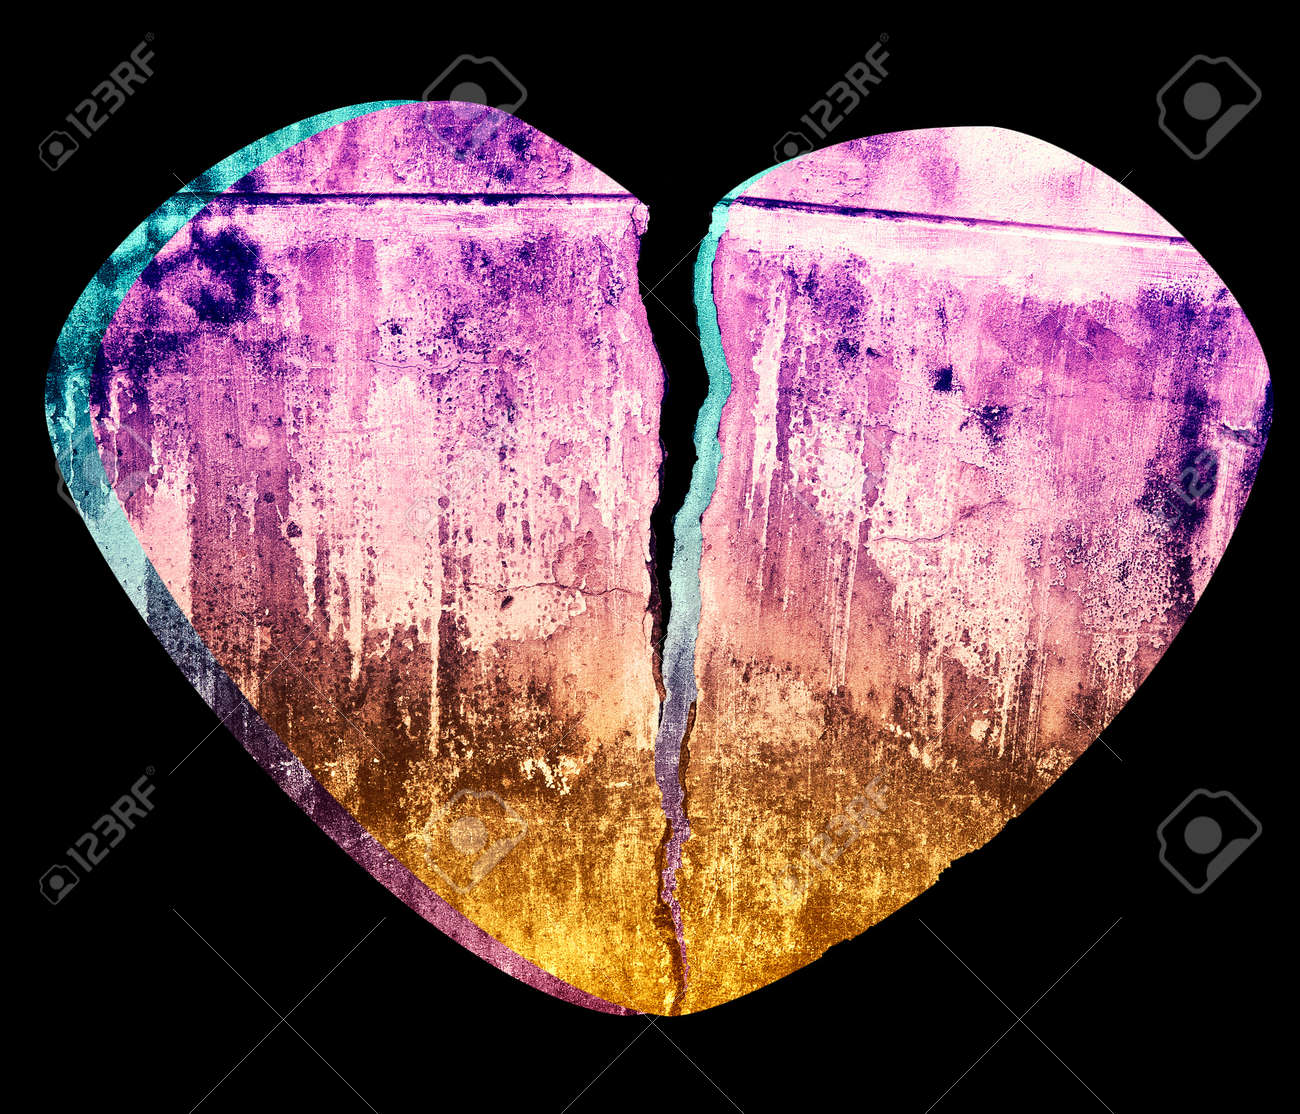 Broken Heart Grunge Crack Style 3D Illustration Isolated on Black Stock Photo - 17380526